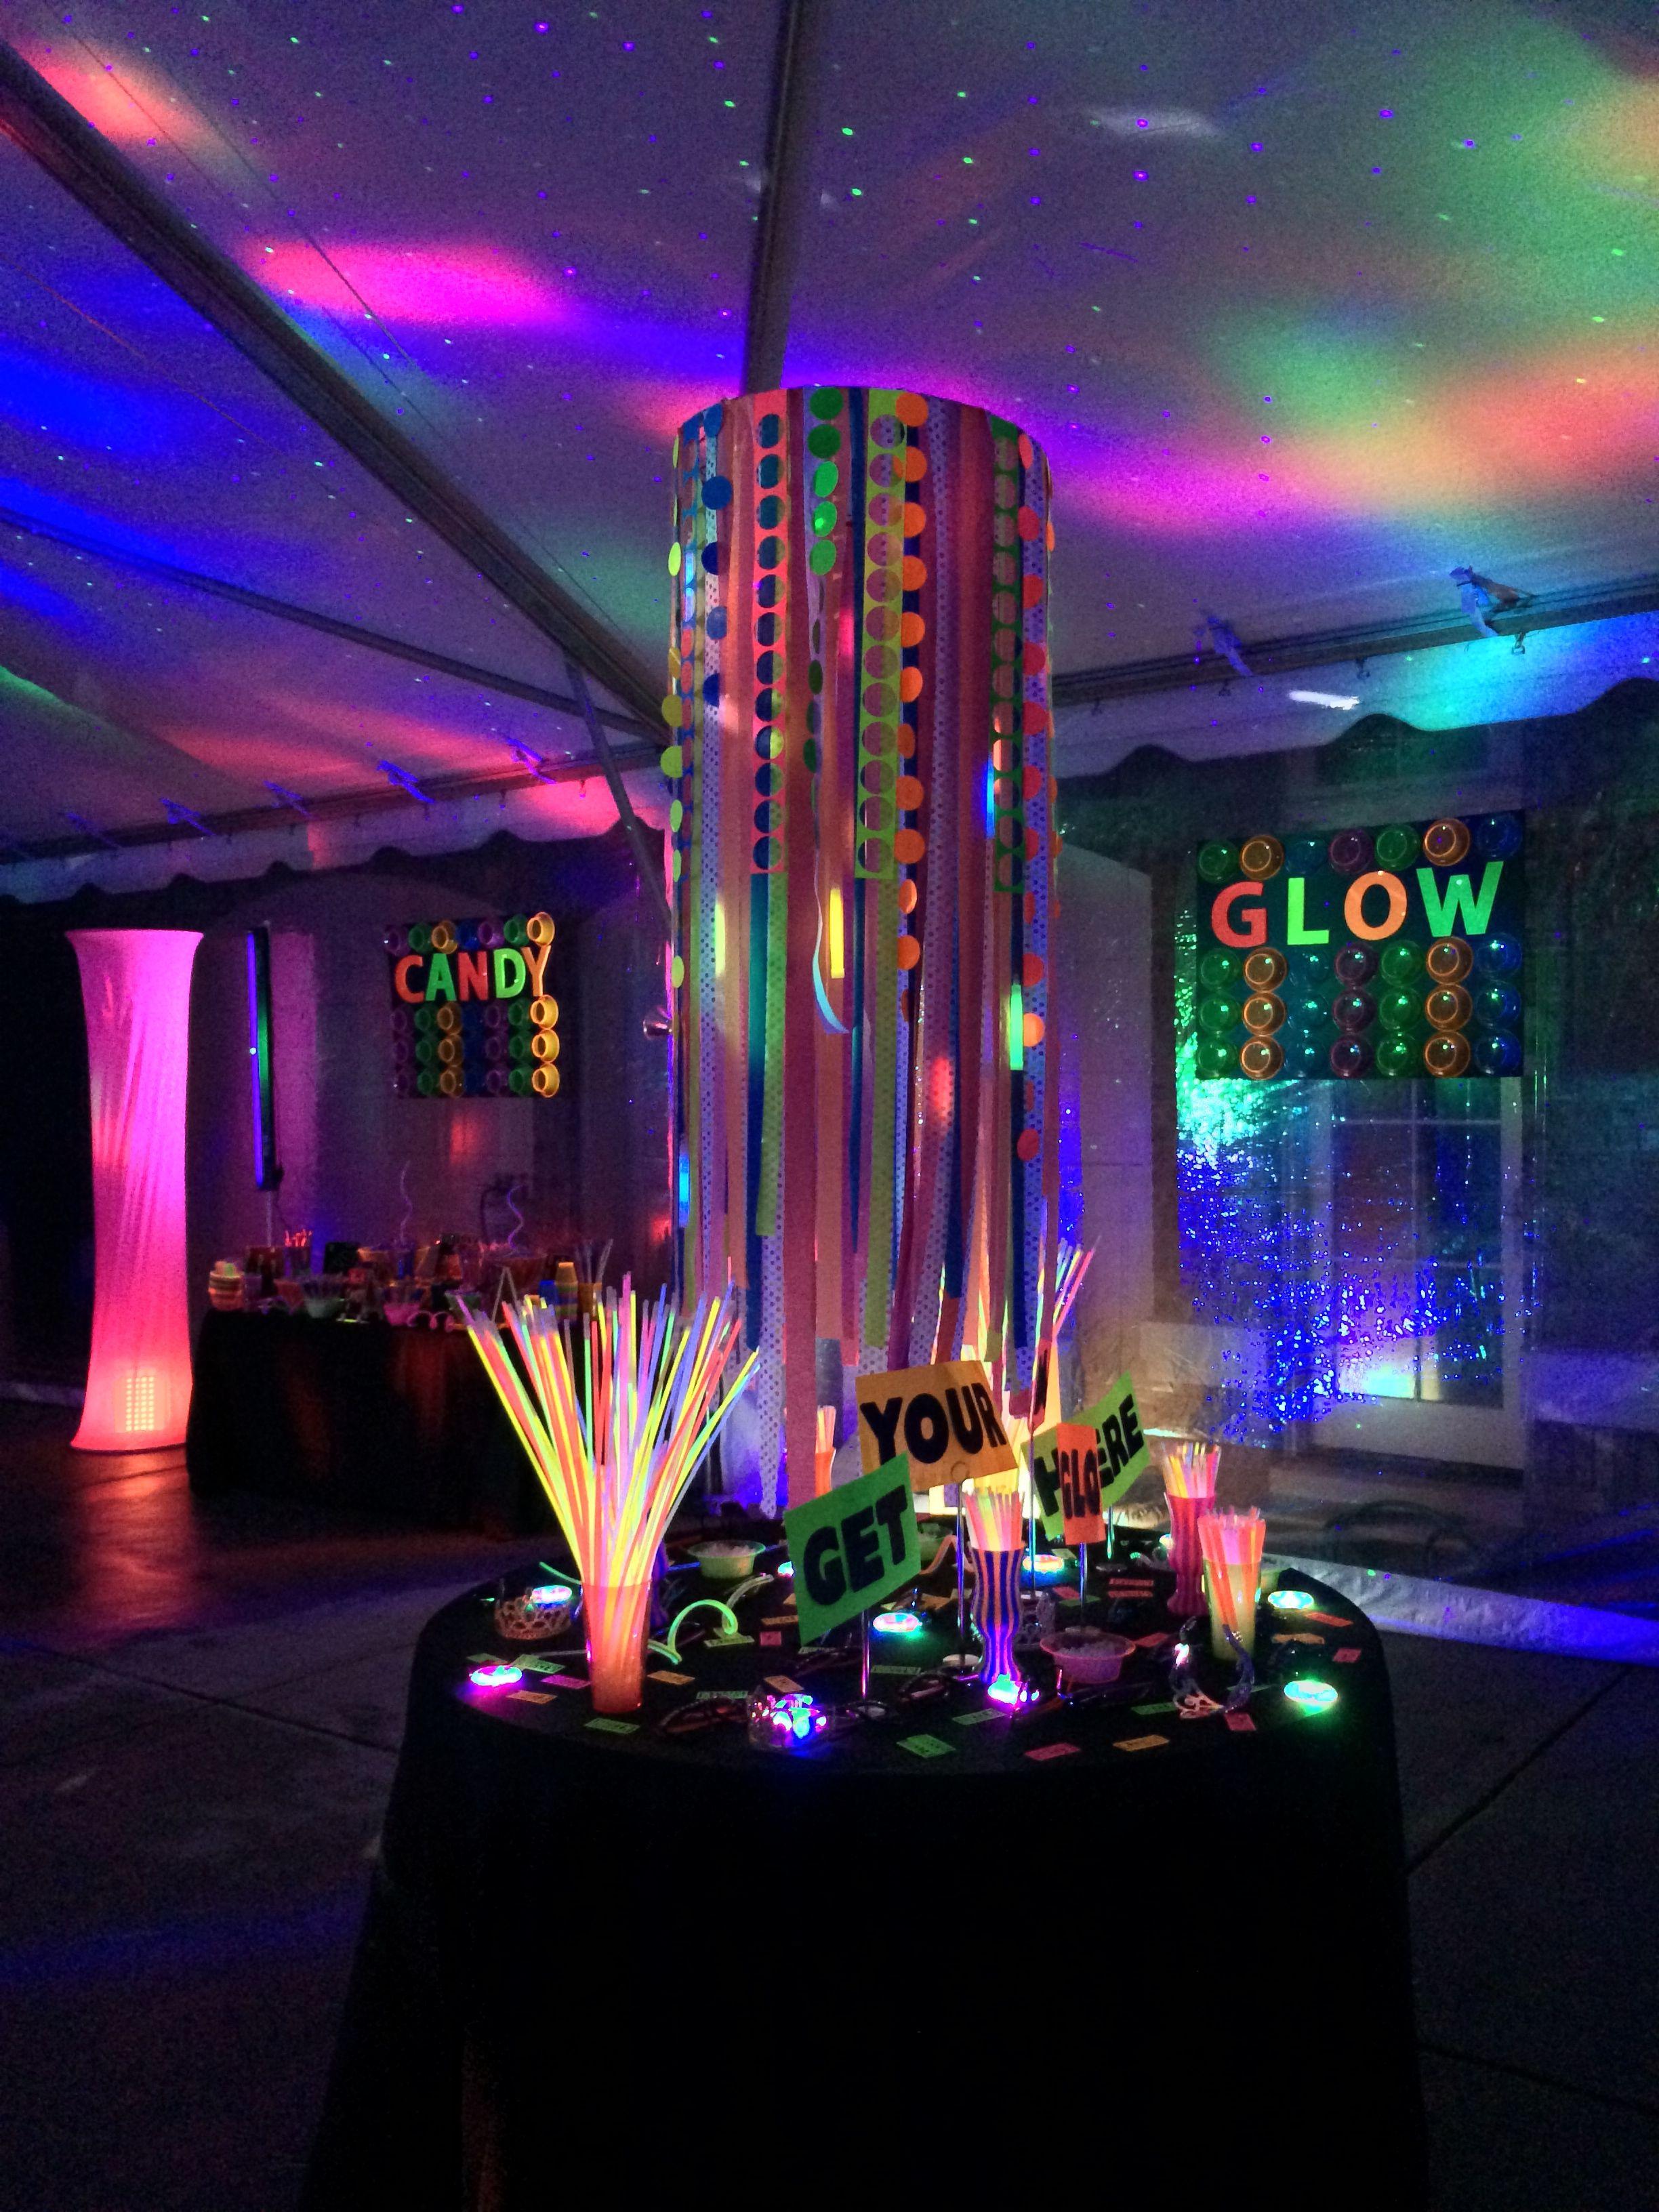 Time to get glowing... | Vestidos 15 | Pinterest | Fiesta de neón ...